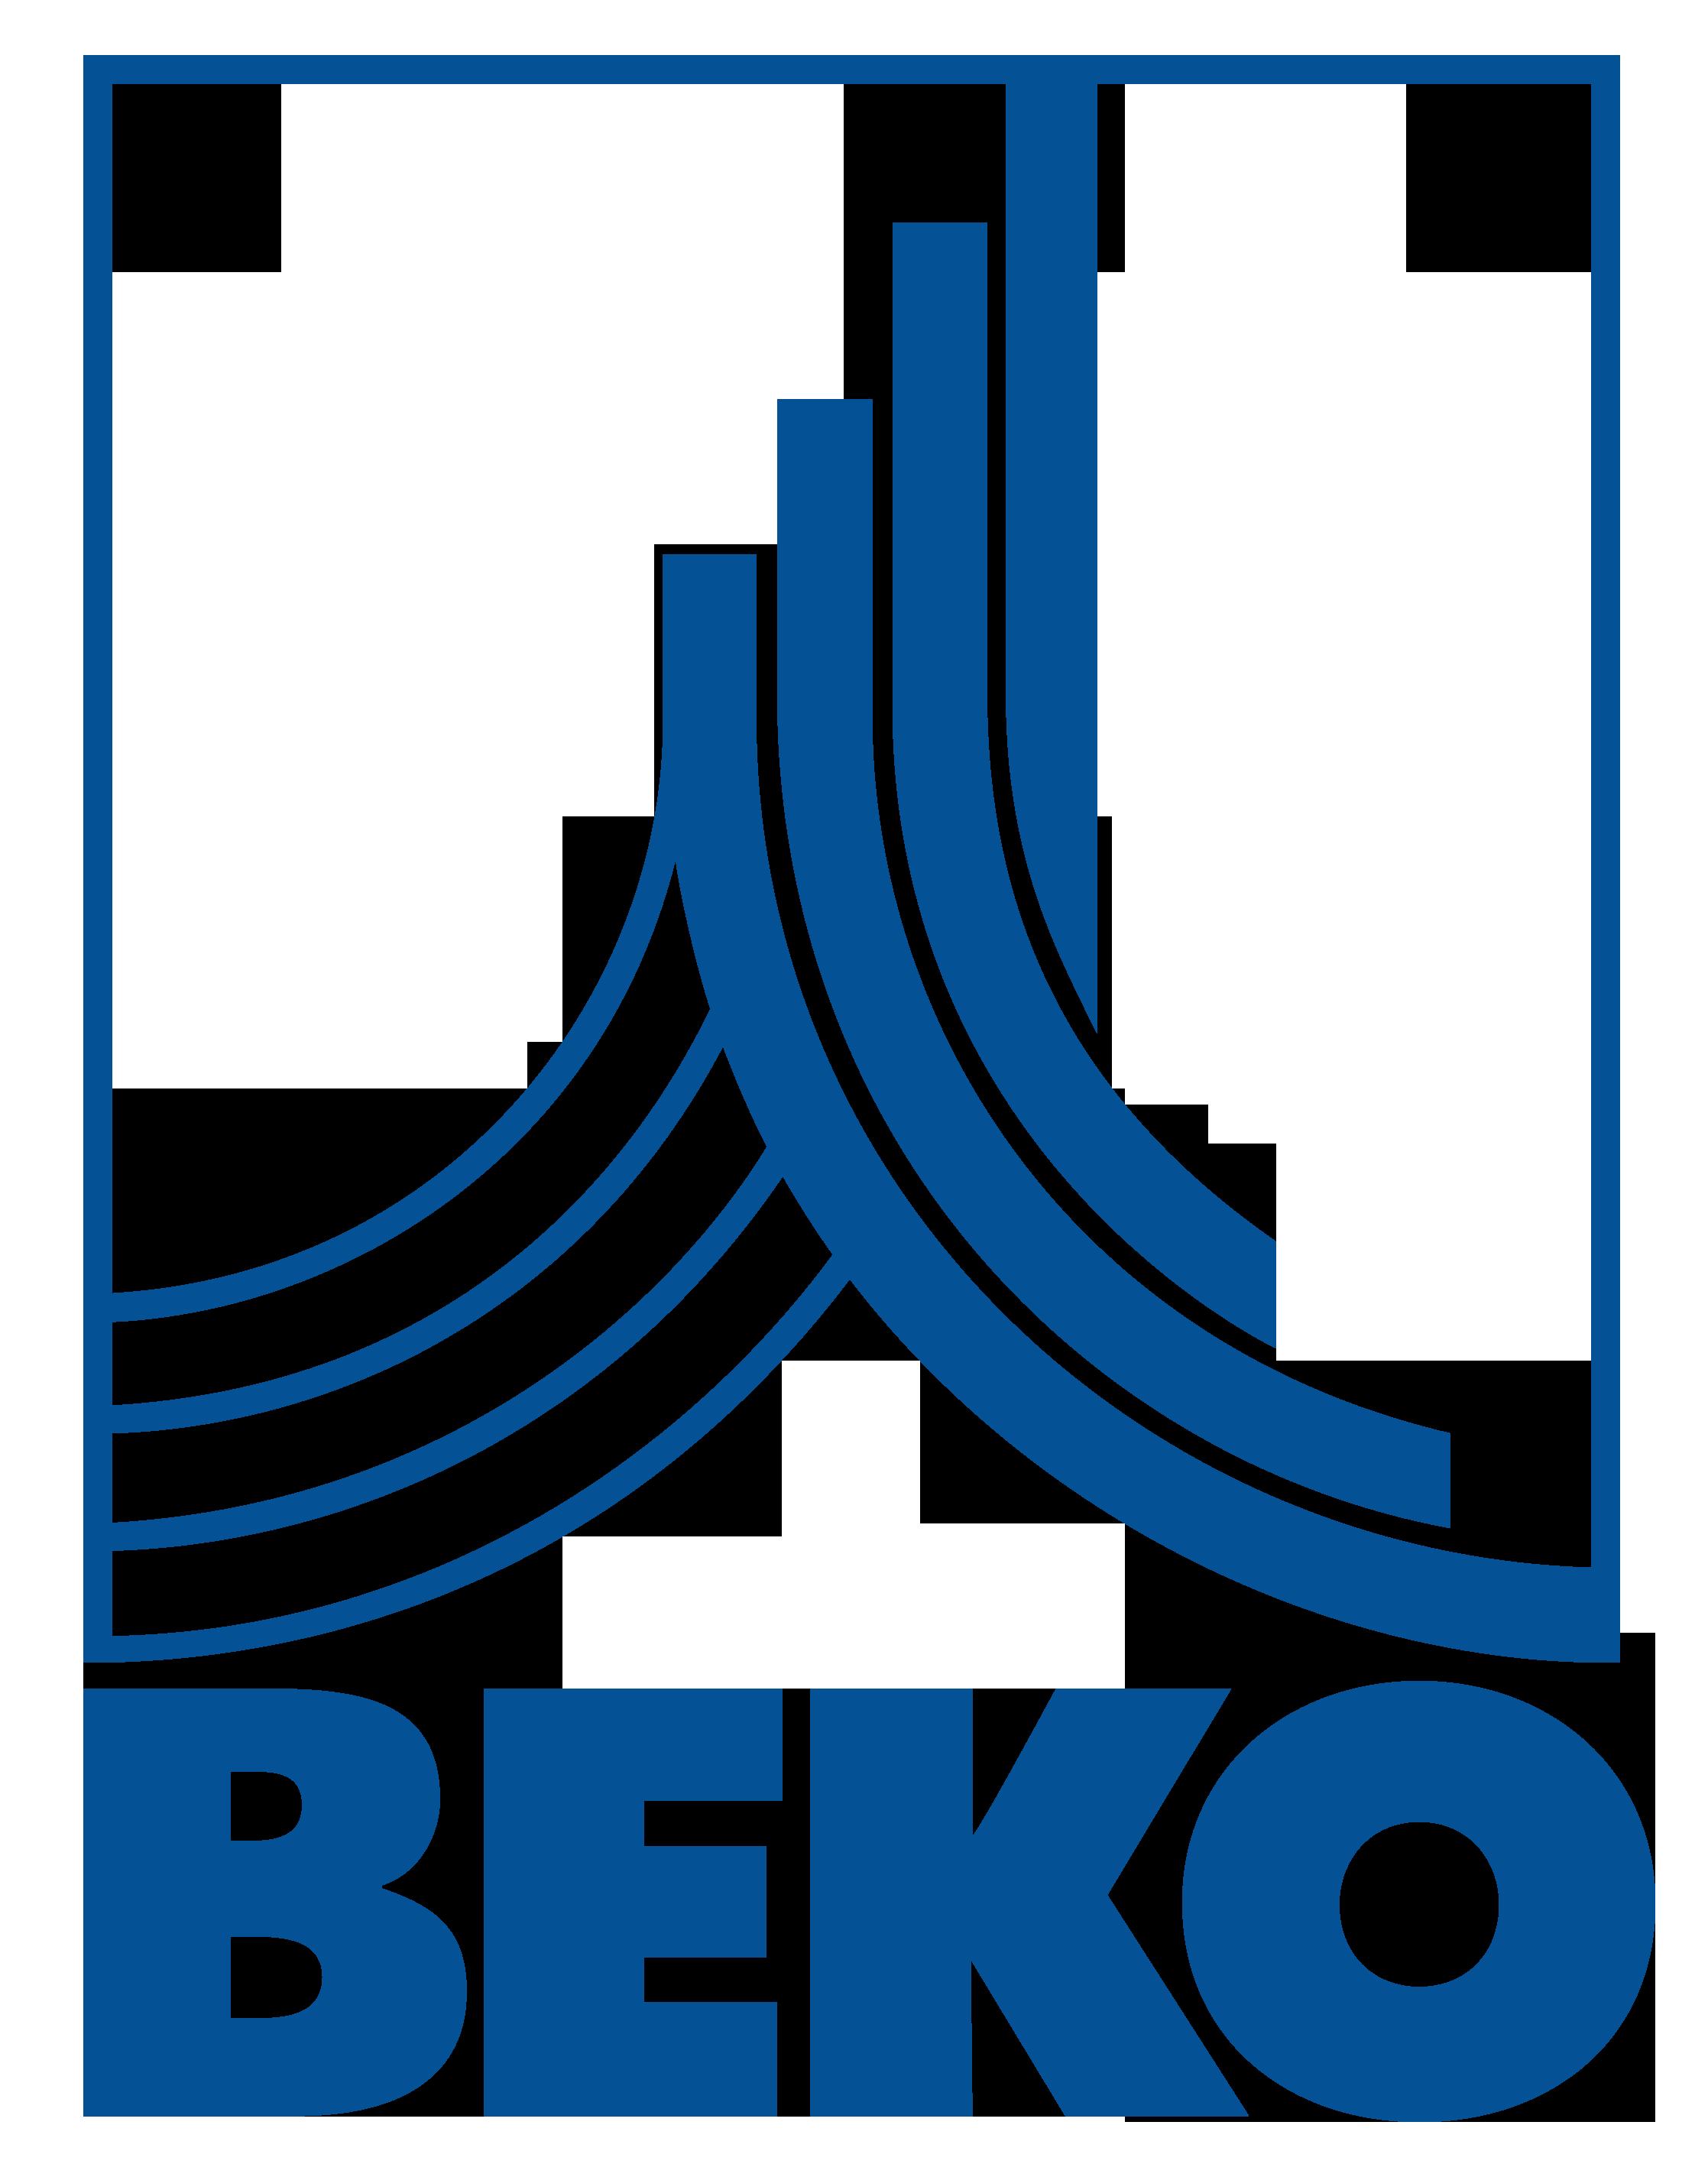 Beko Logo PNG Wallpaper